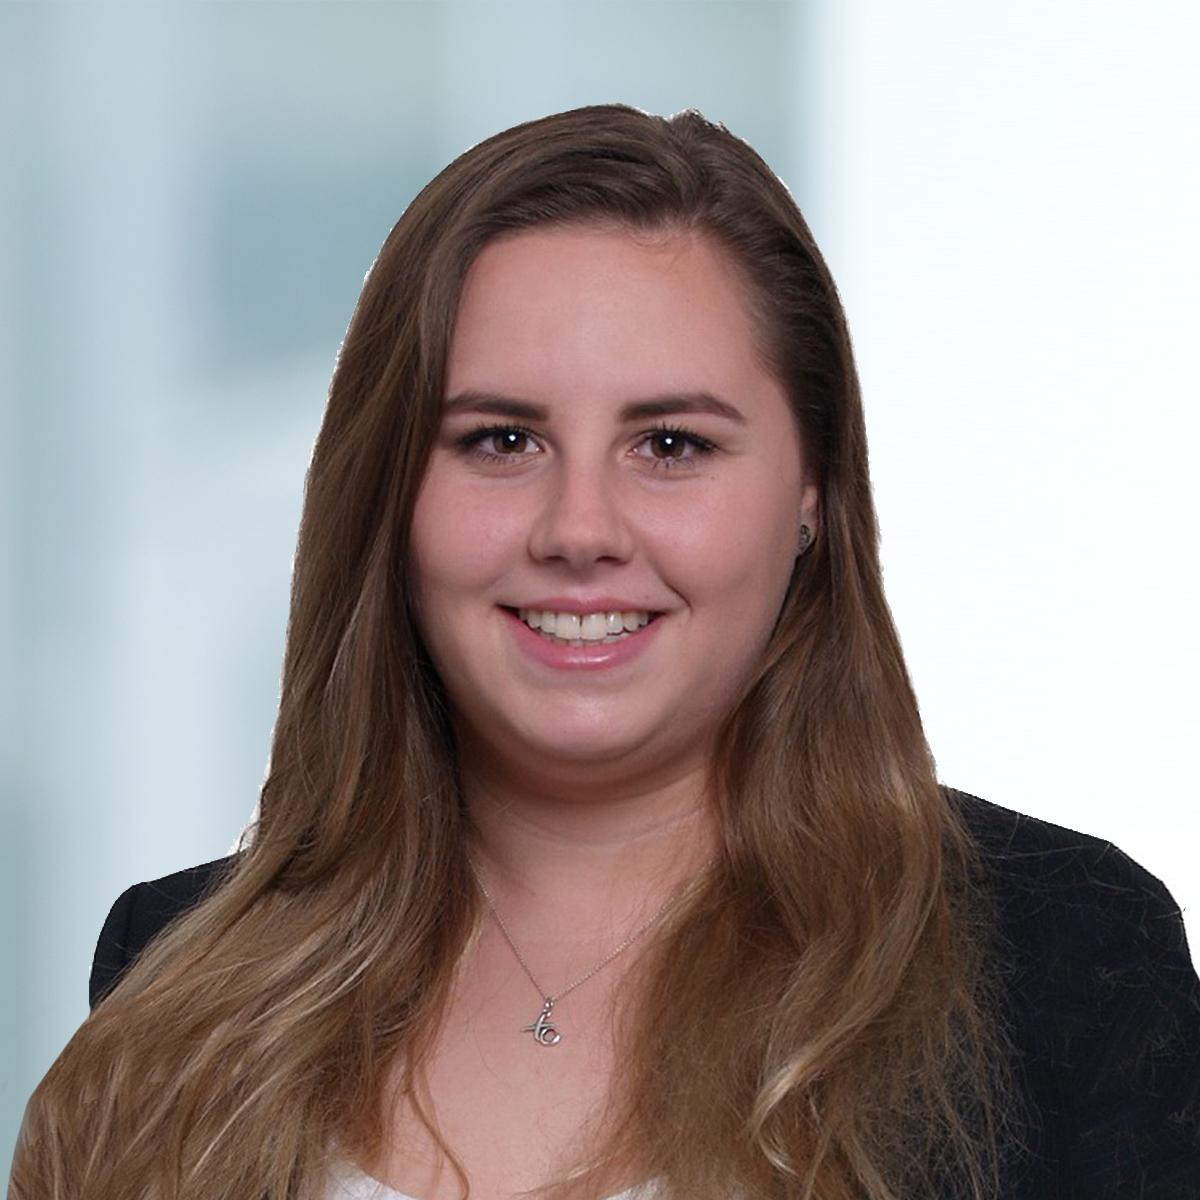 Katja Steißlinger_Interview der Assistenz der Geschäftsführung